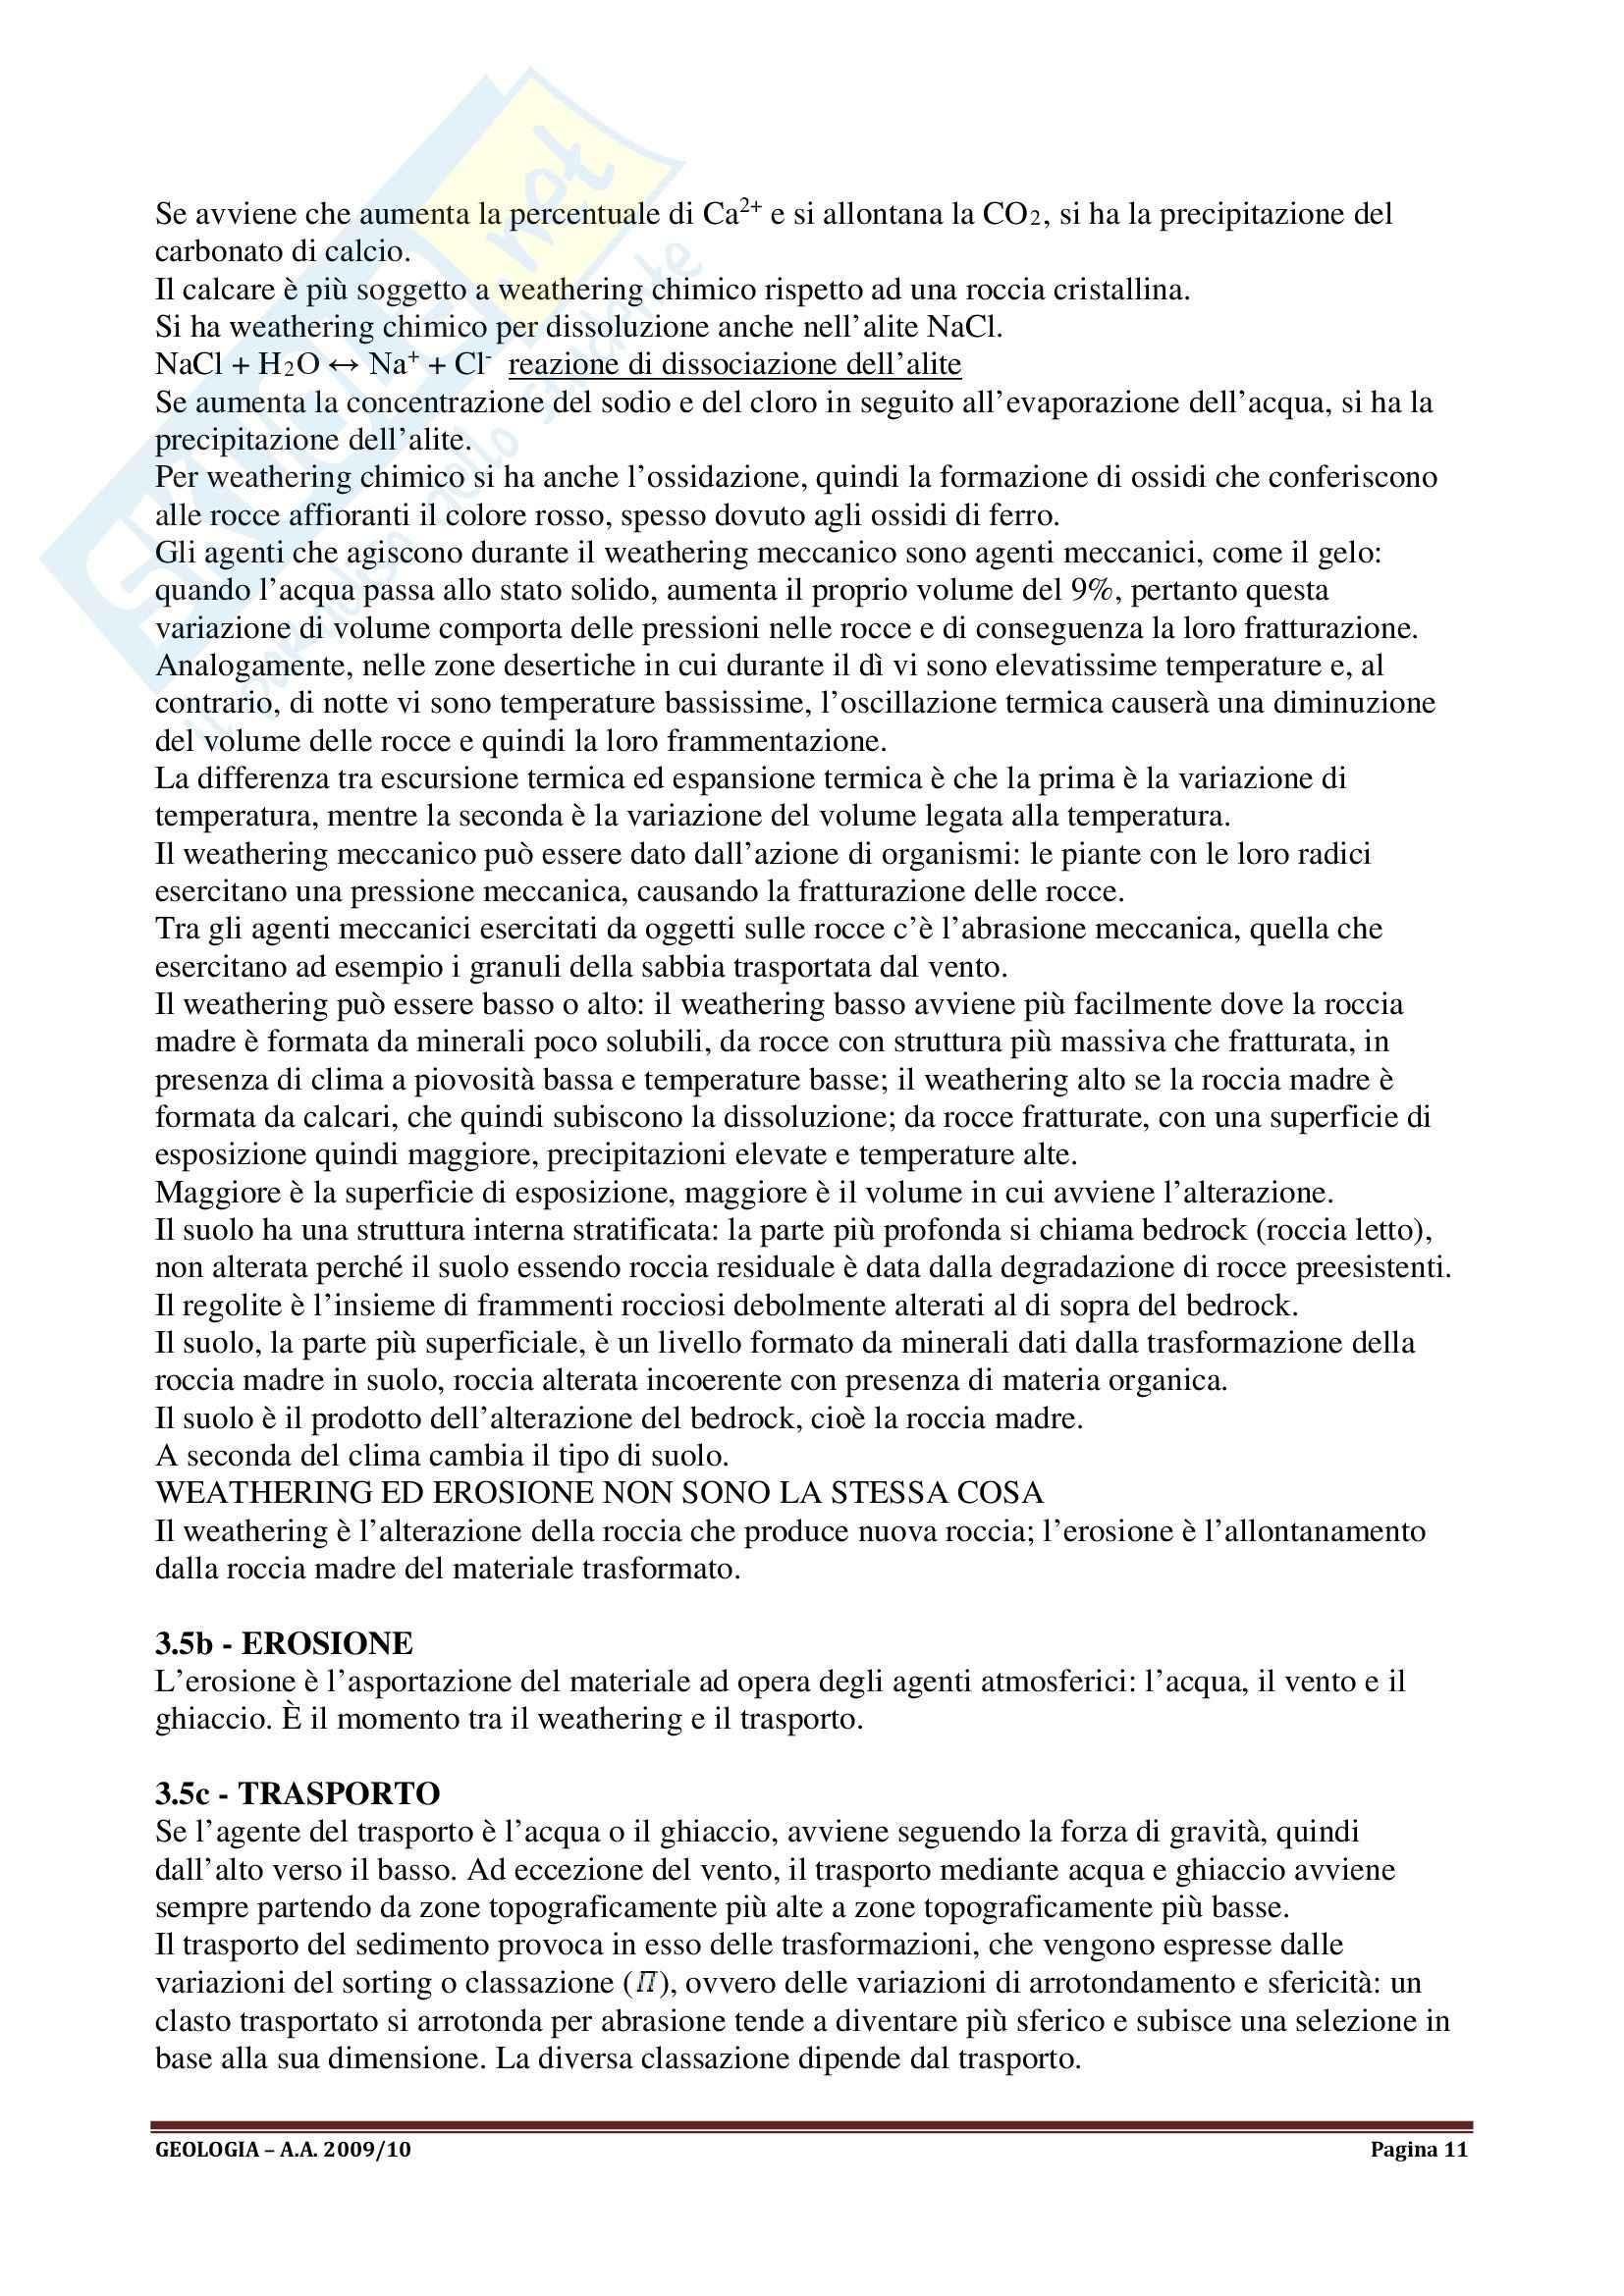 Geologia I - Appunti Pag. 11